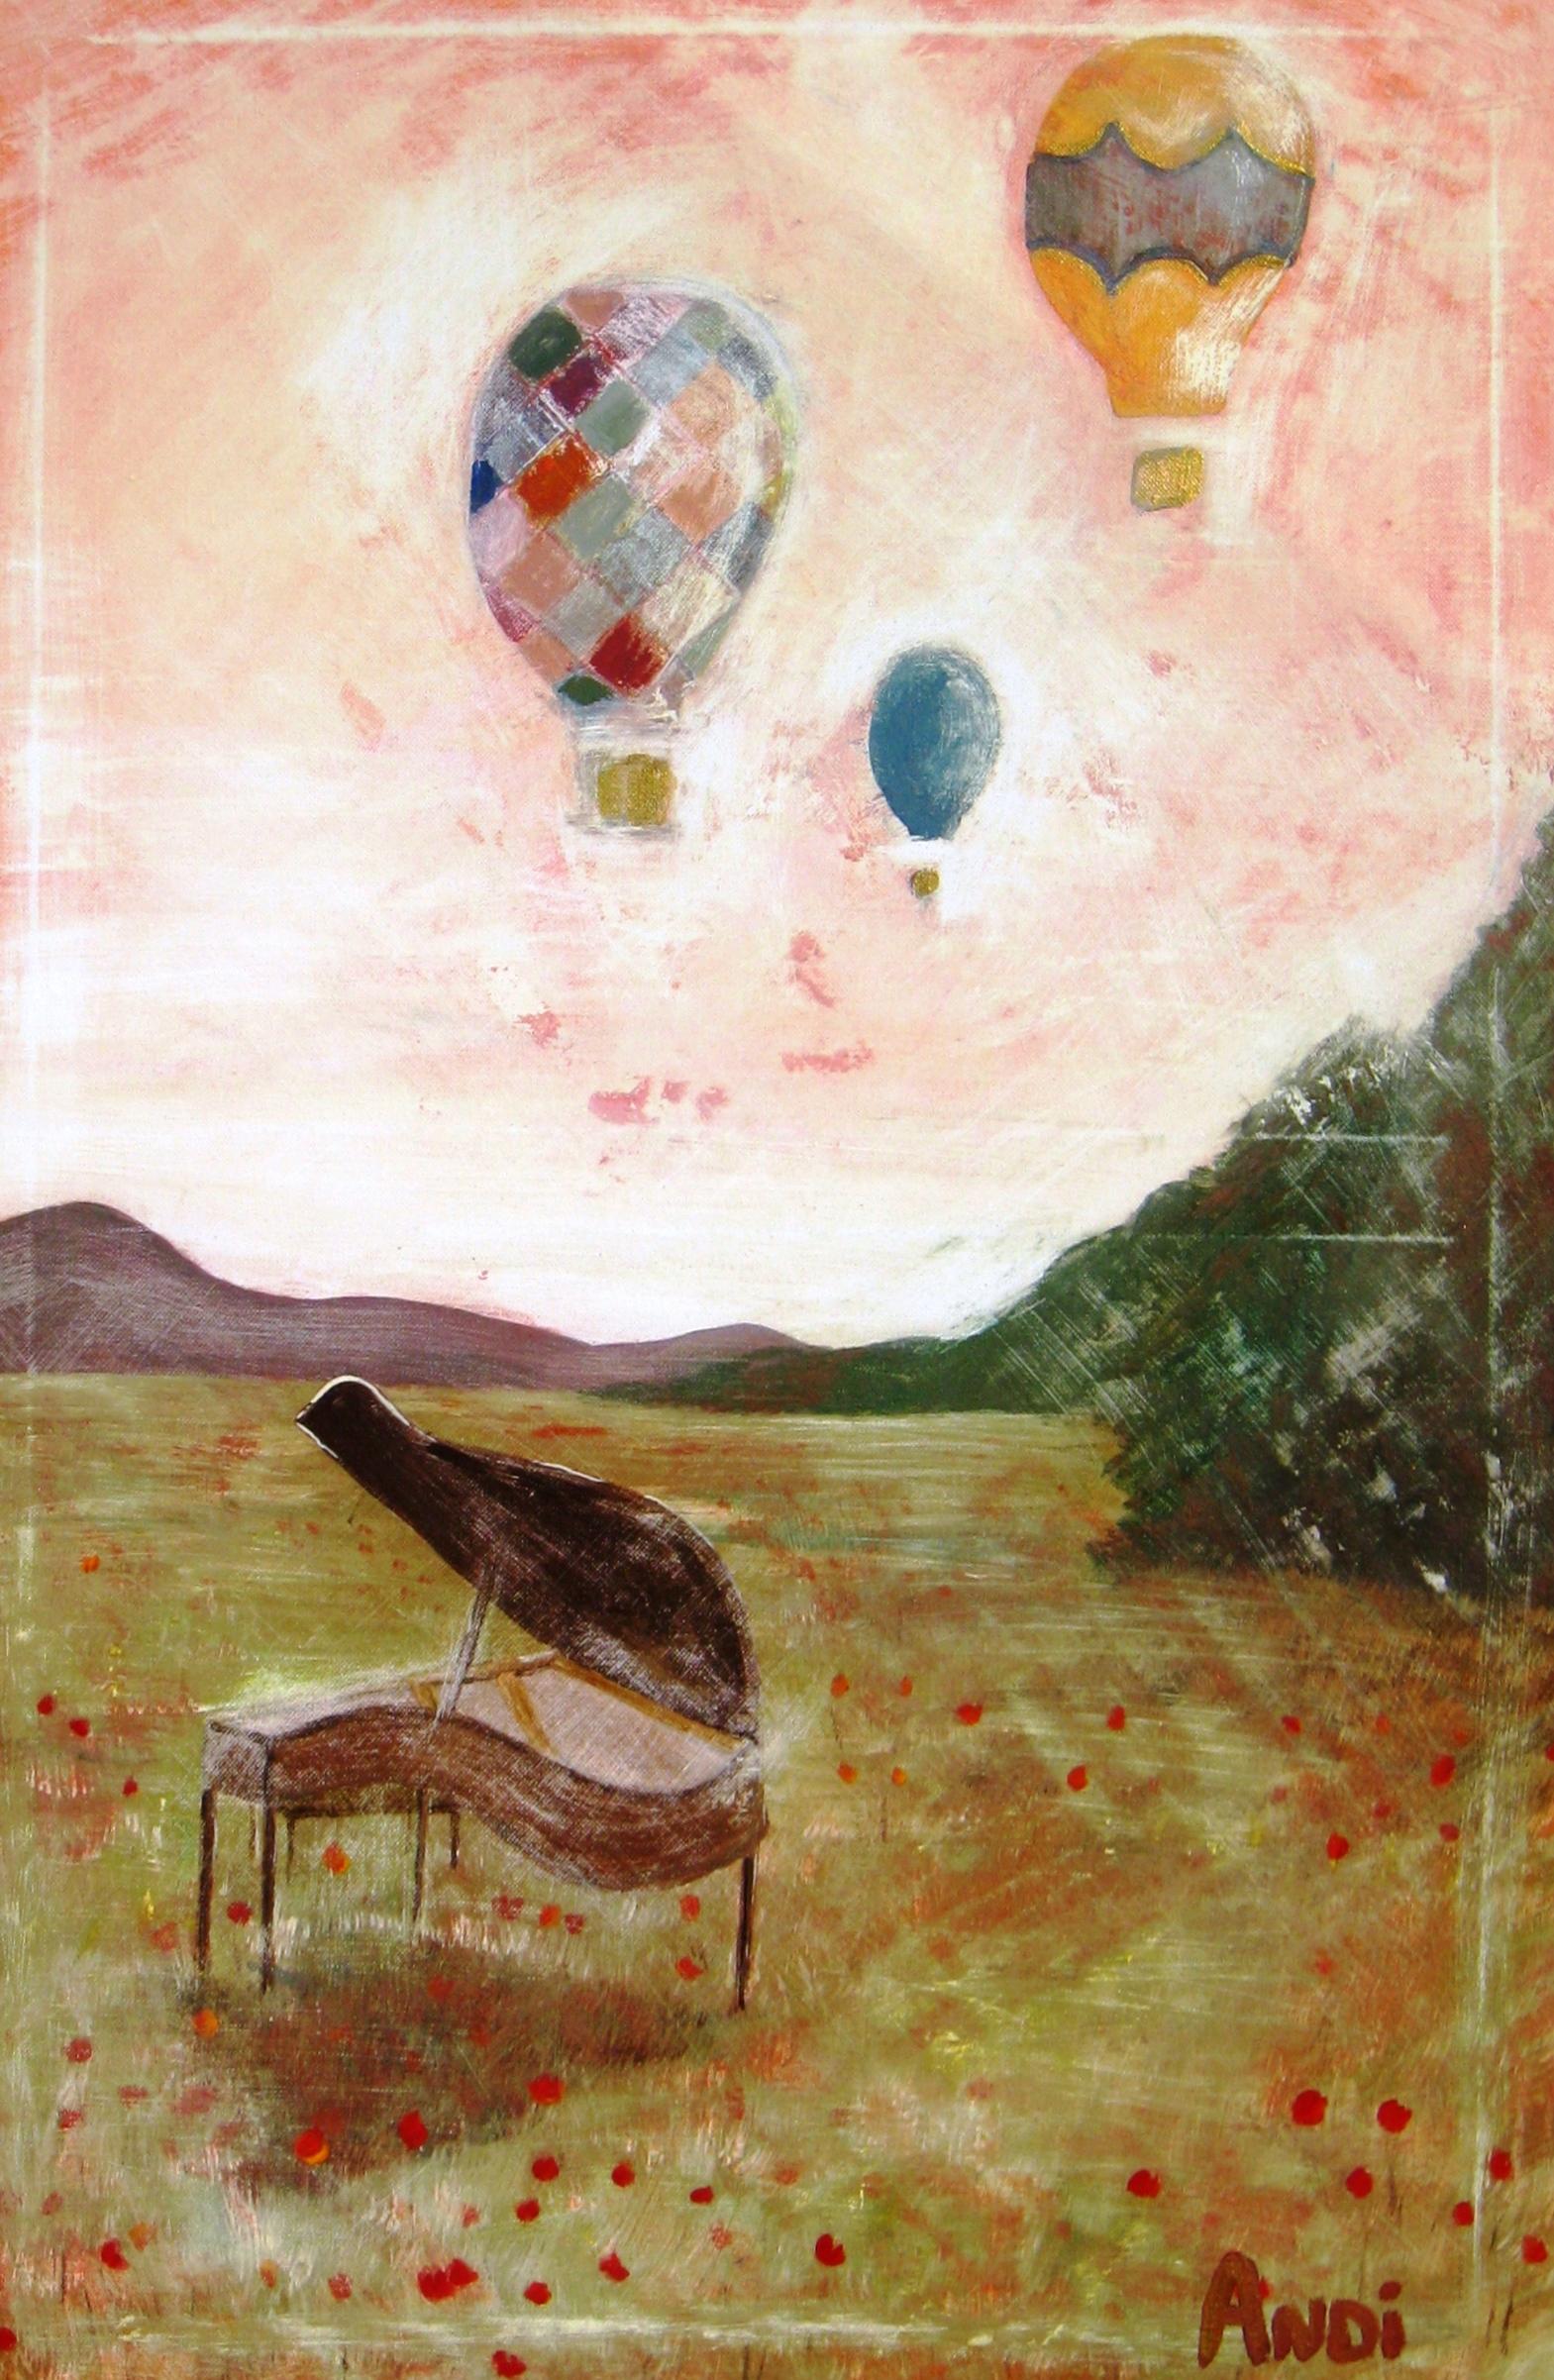 Piano and Balloons